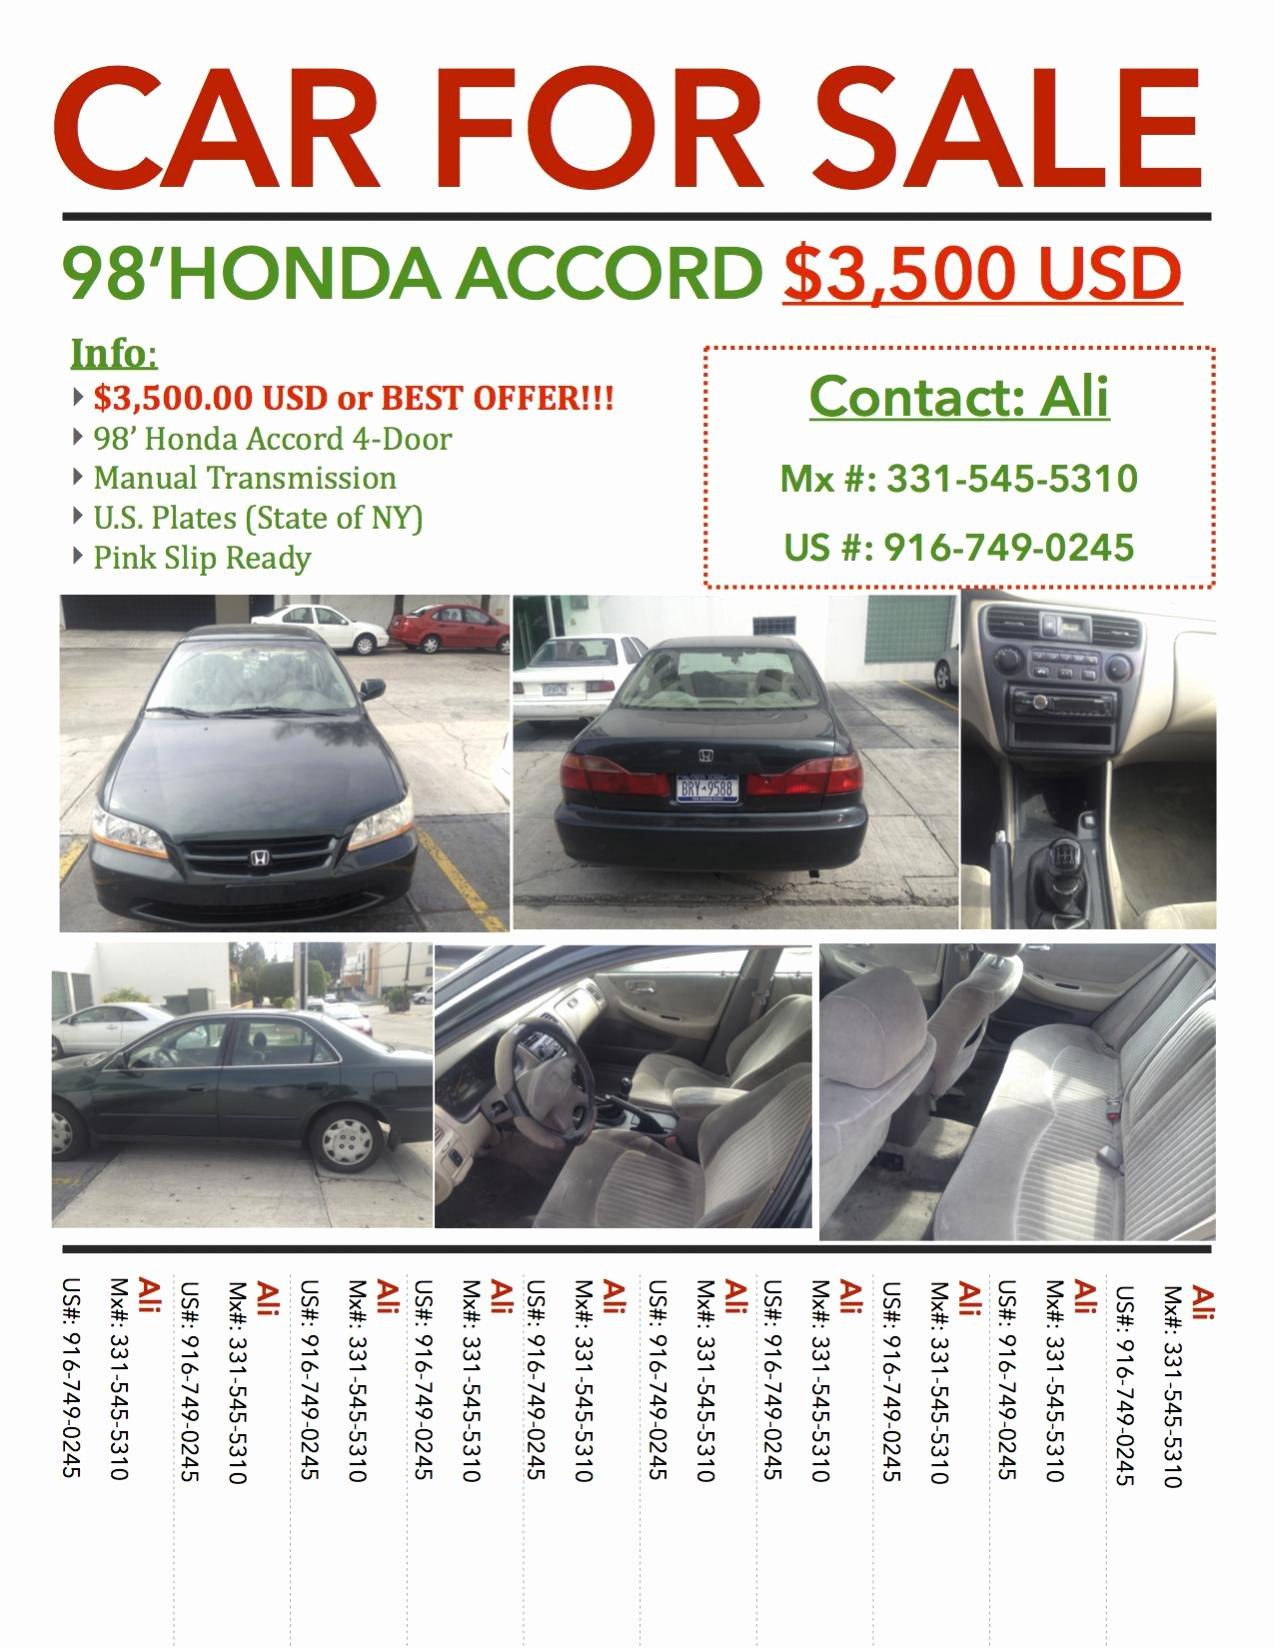 Car for Sale Flyer Template Elegant Car for Sale Honda Accord